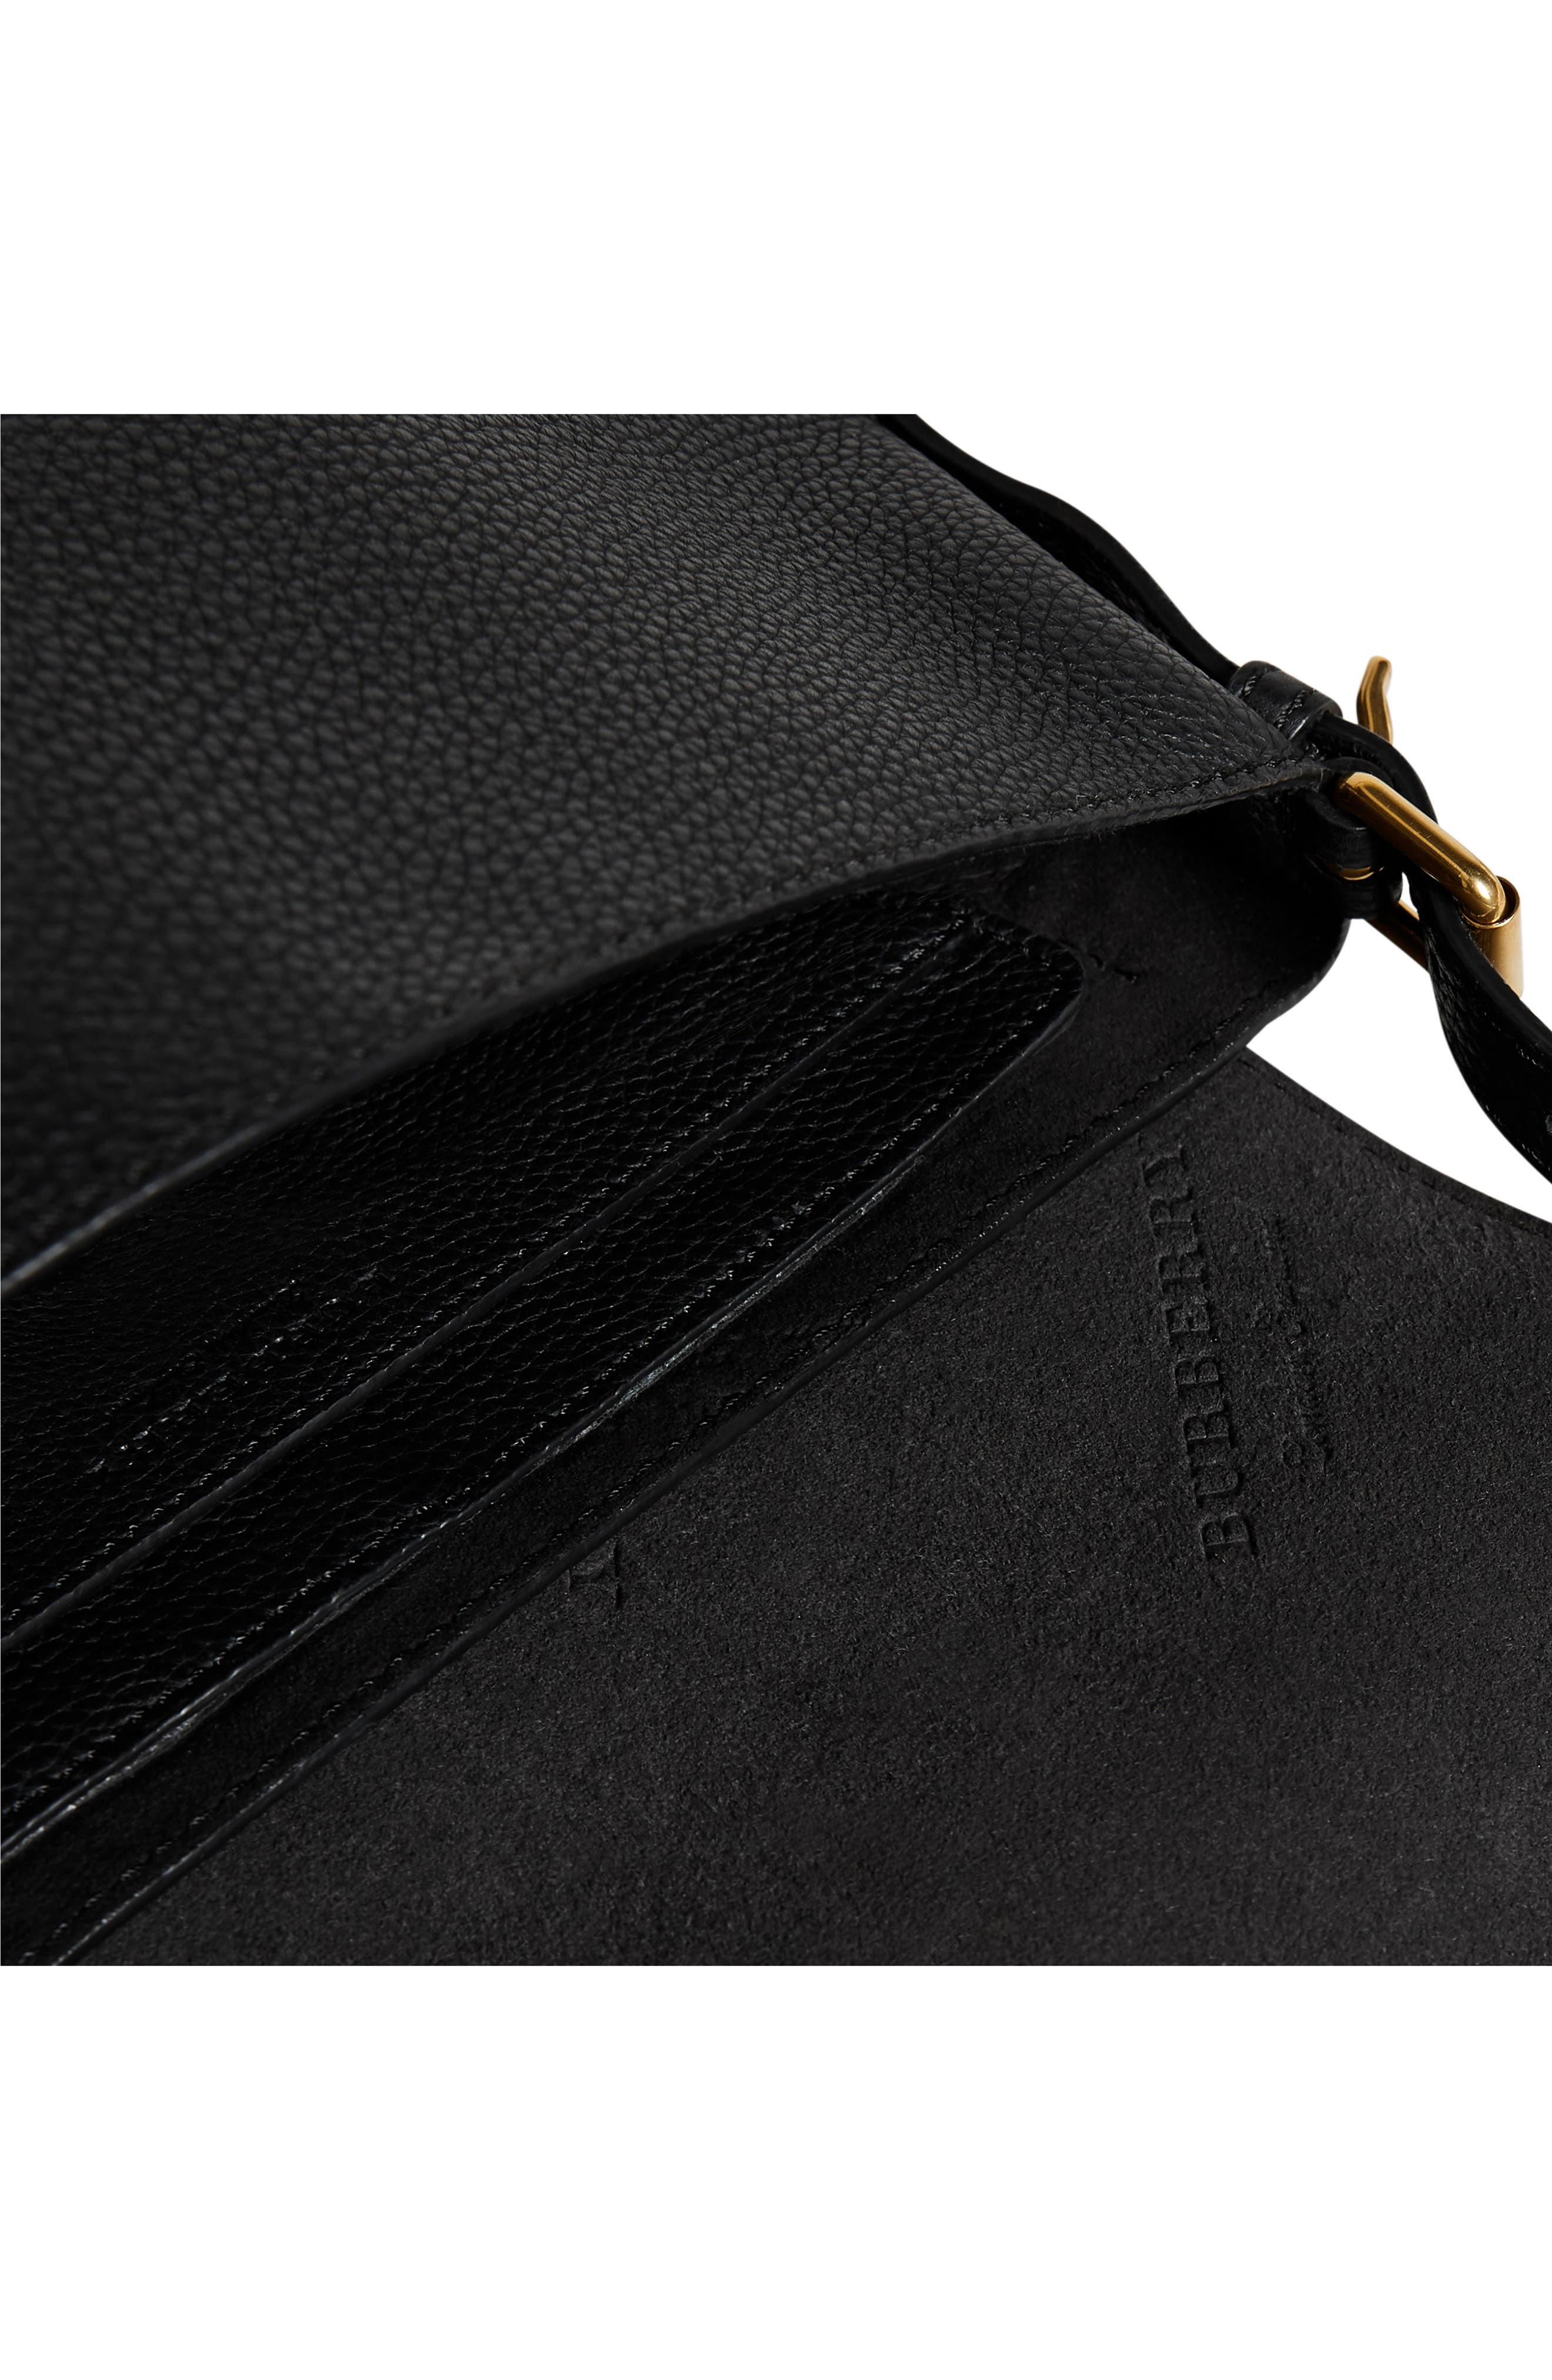 Small Burleigh Leather Crossbody Bag,                             Alternate thumbnail 8, color,                             001